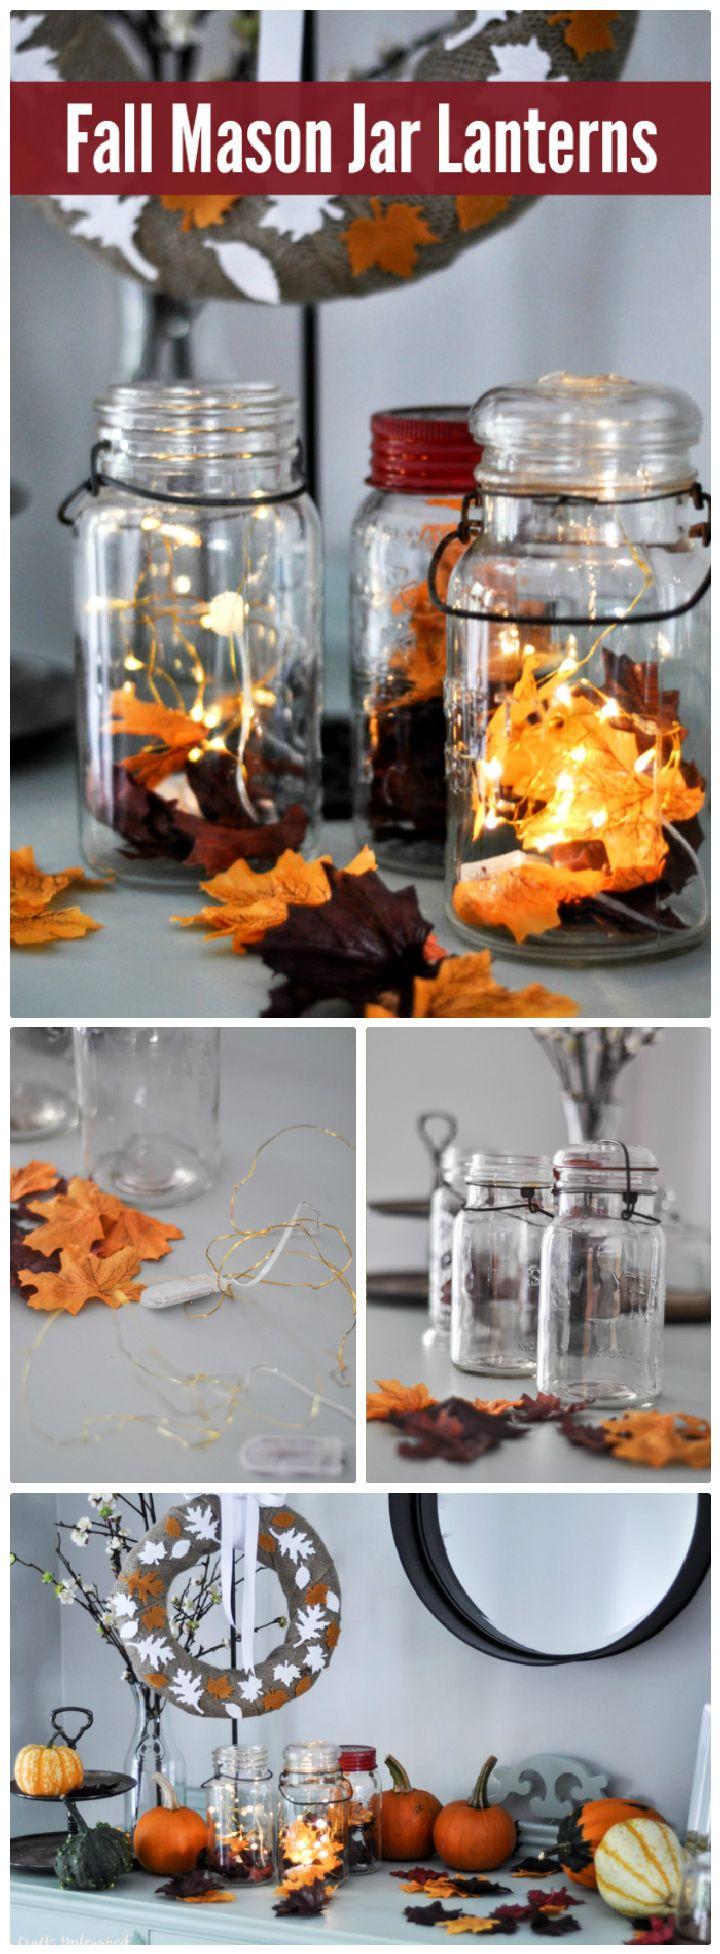 mason jar craft ideas | mason jar craft ideas diy | mason jar craft ideas christmas | mason jar craft ideas decor | mason jar craft ideas for kids